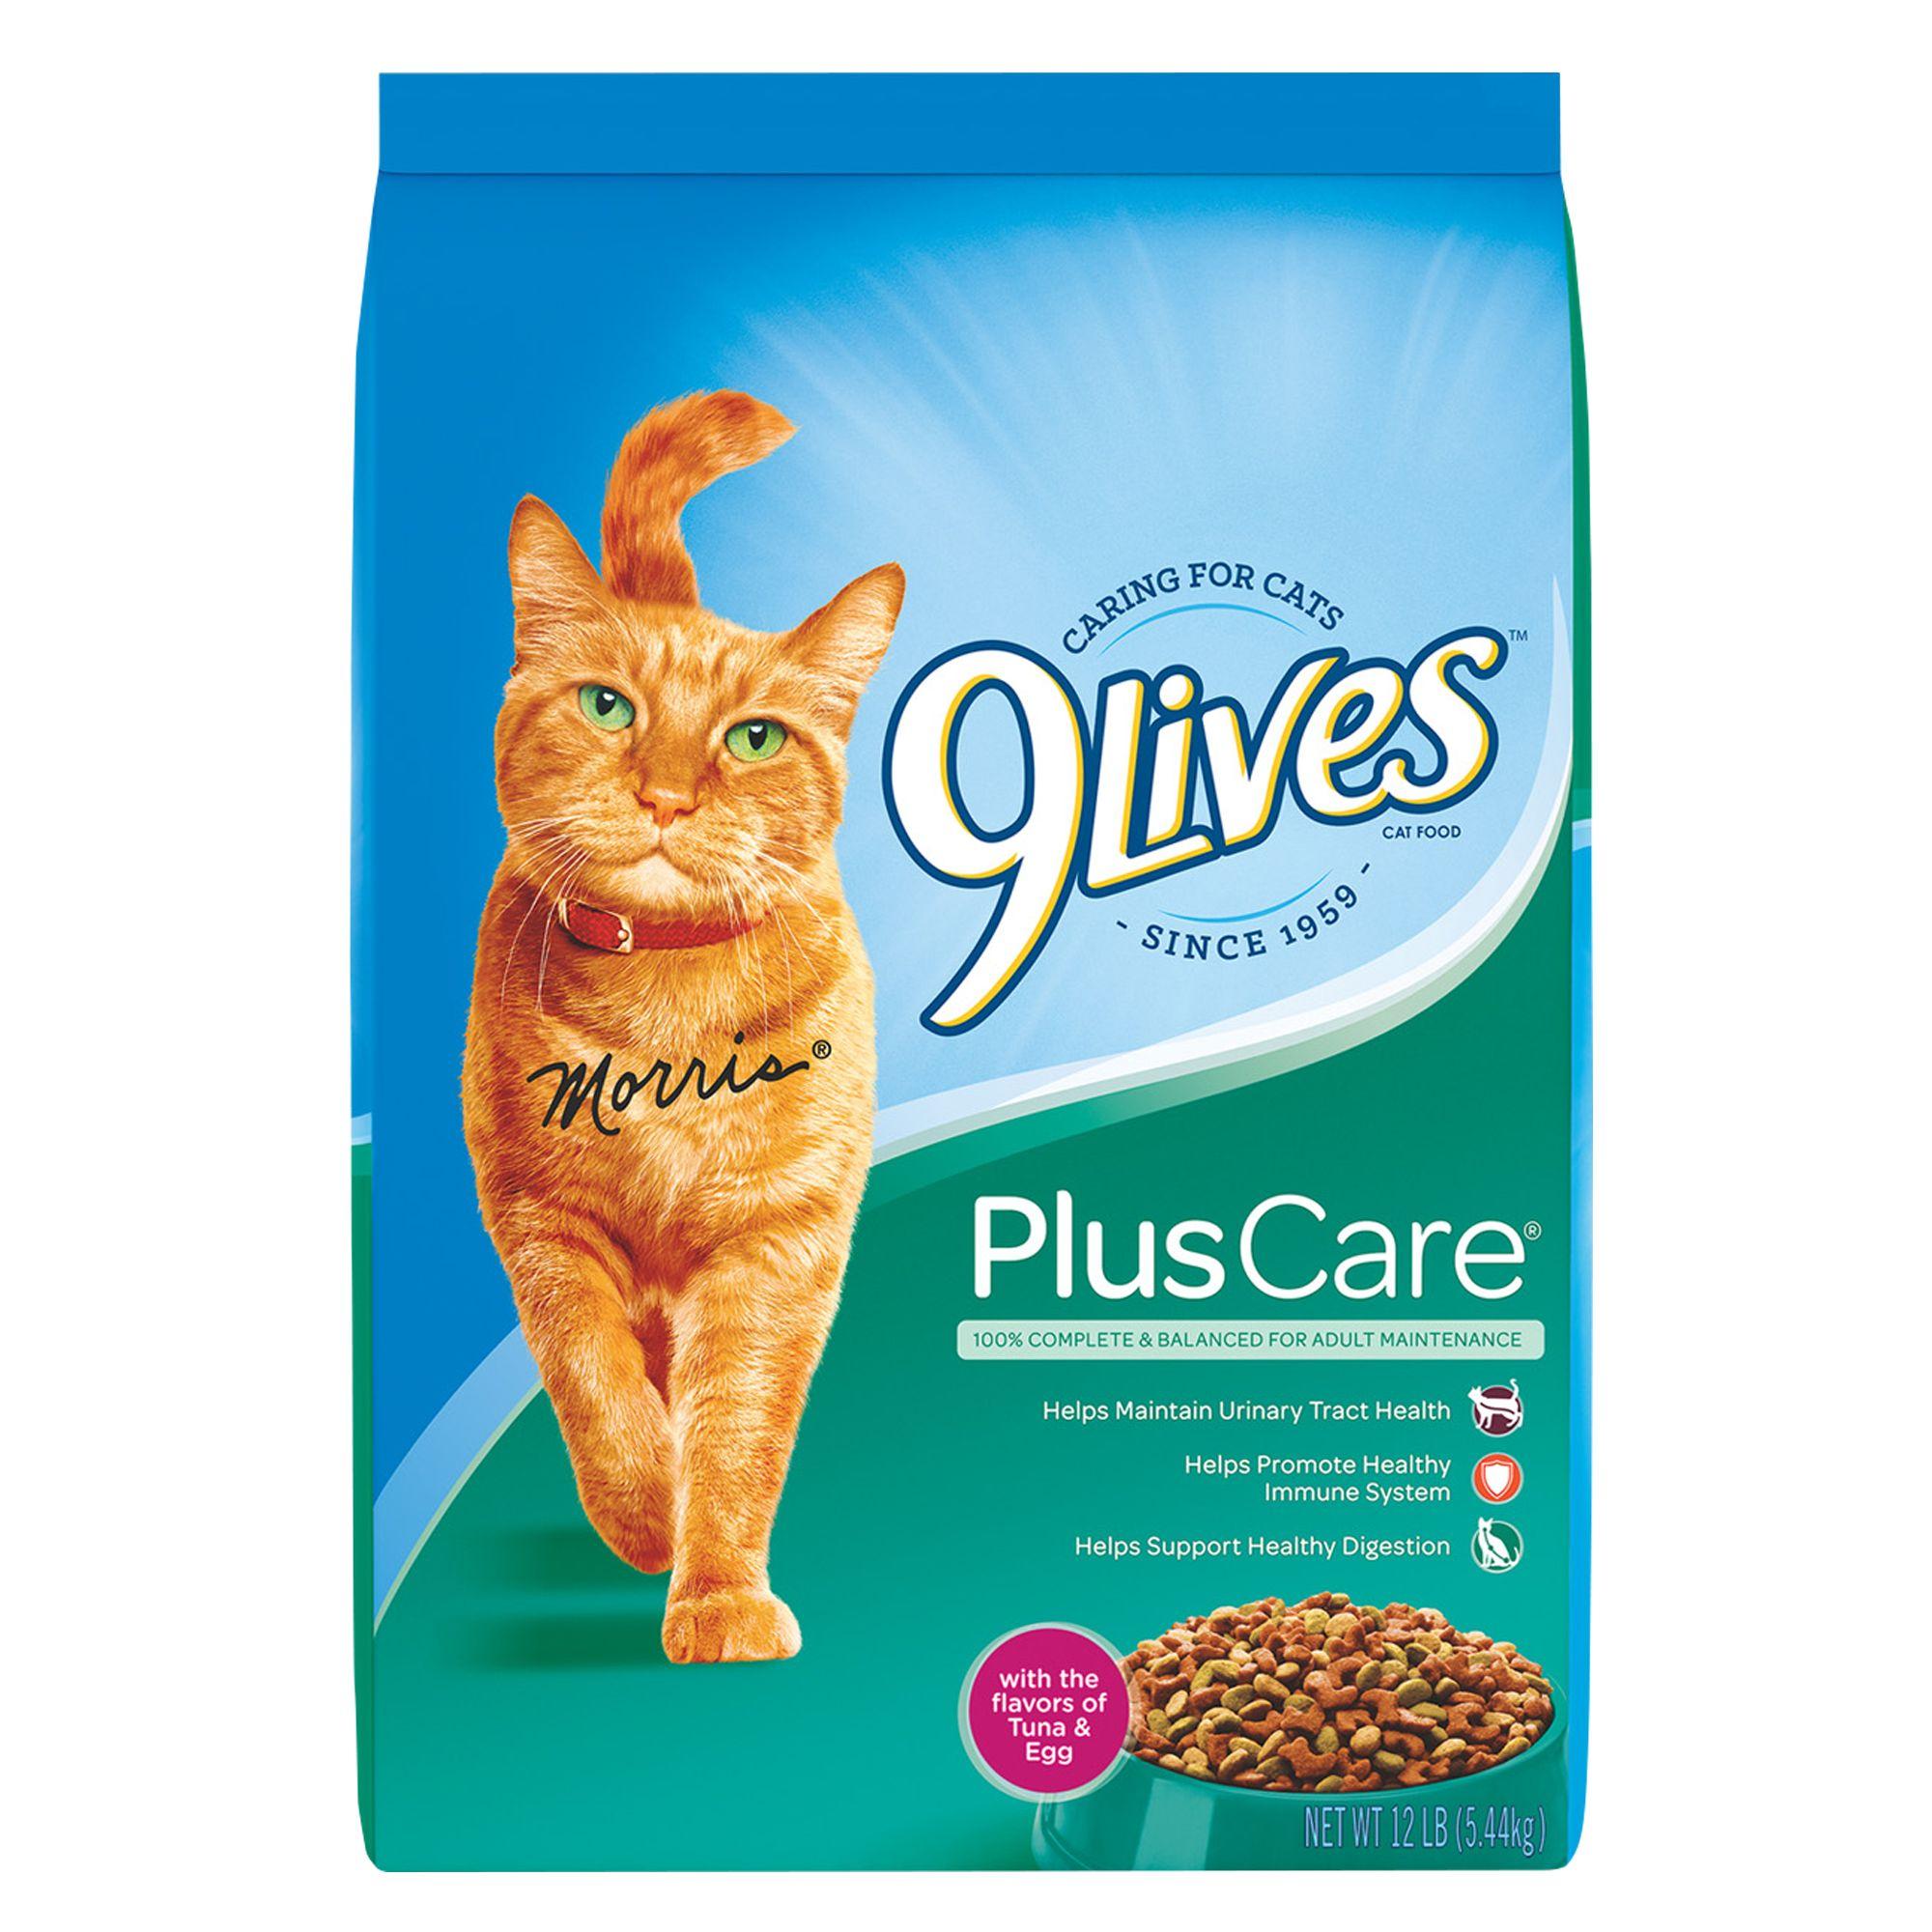 9lives Plus Care Cat Food Tuna And Egg Size 12 Lb